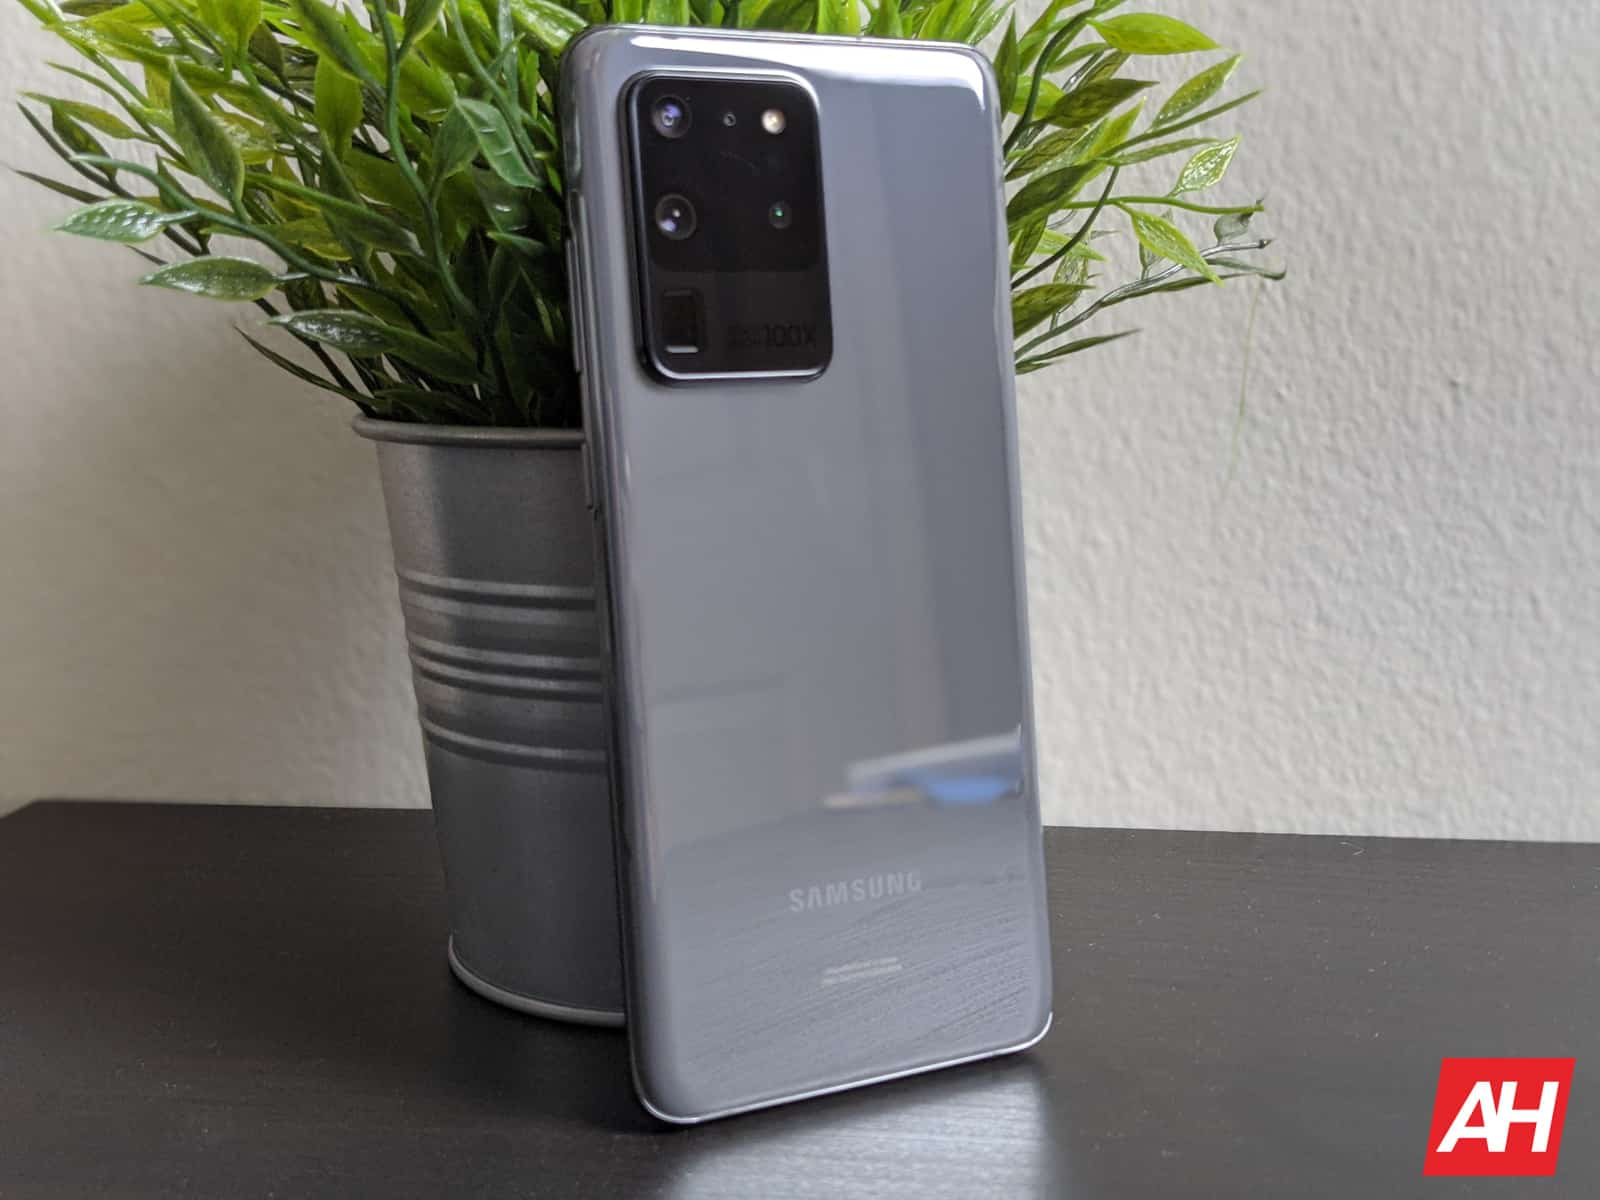 Samsung Galaxy S20 Ultra Review AM AH 8